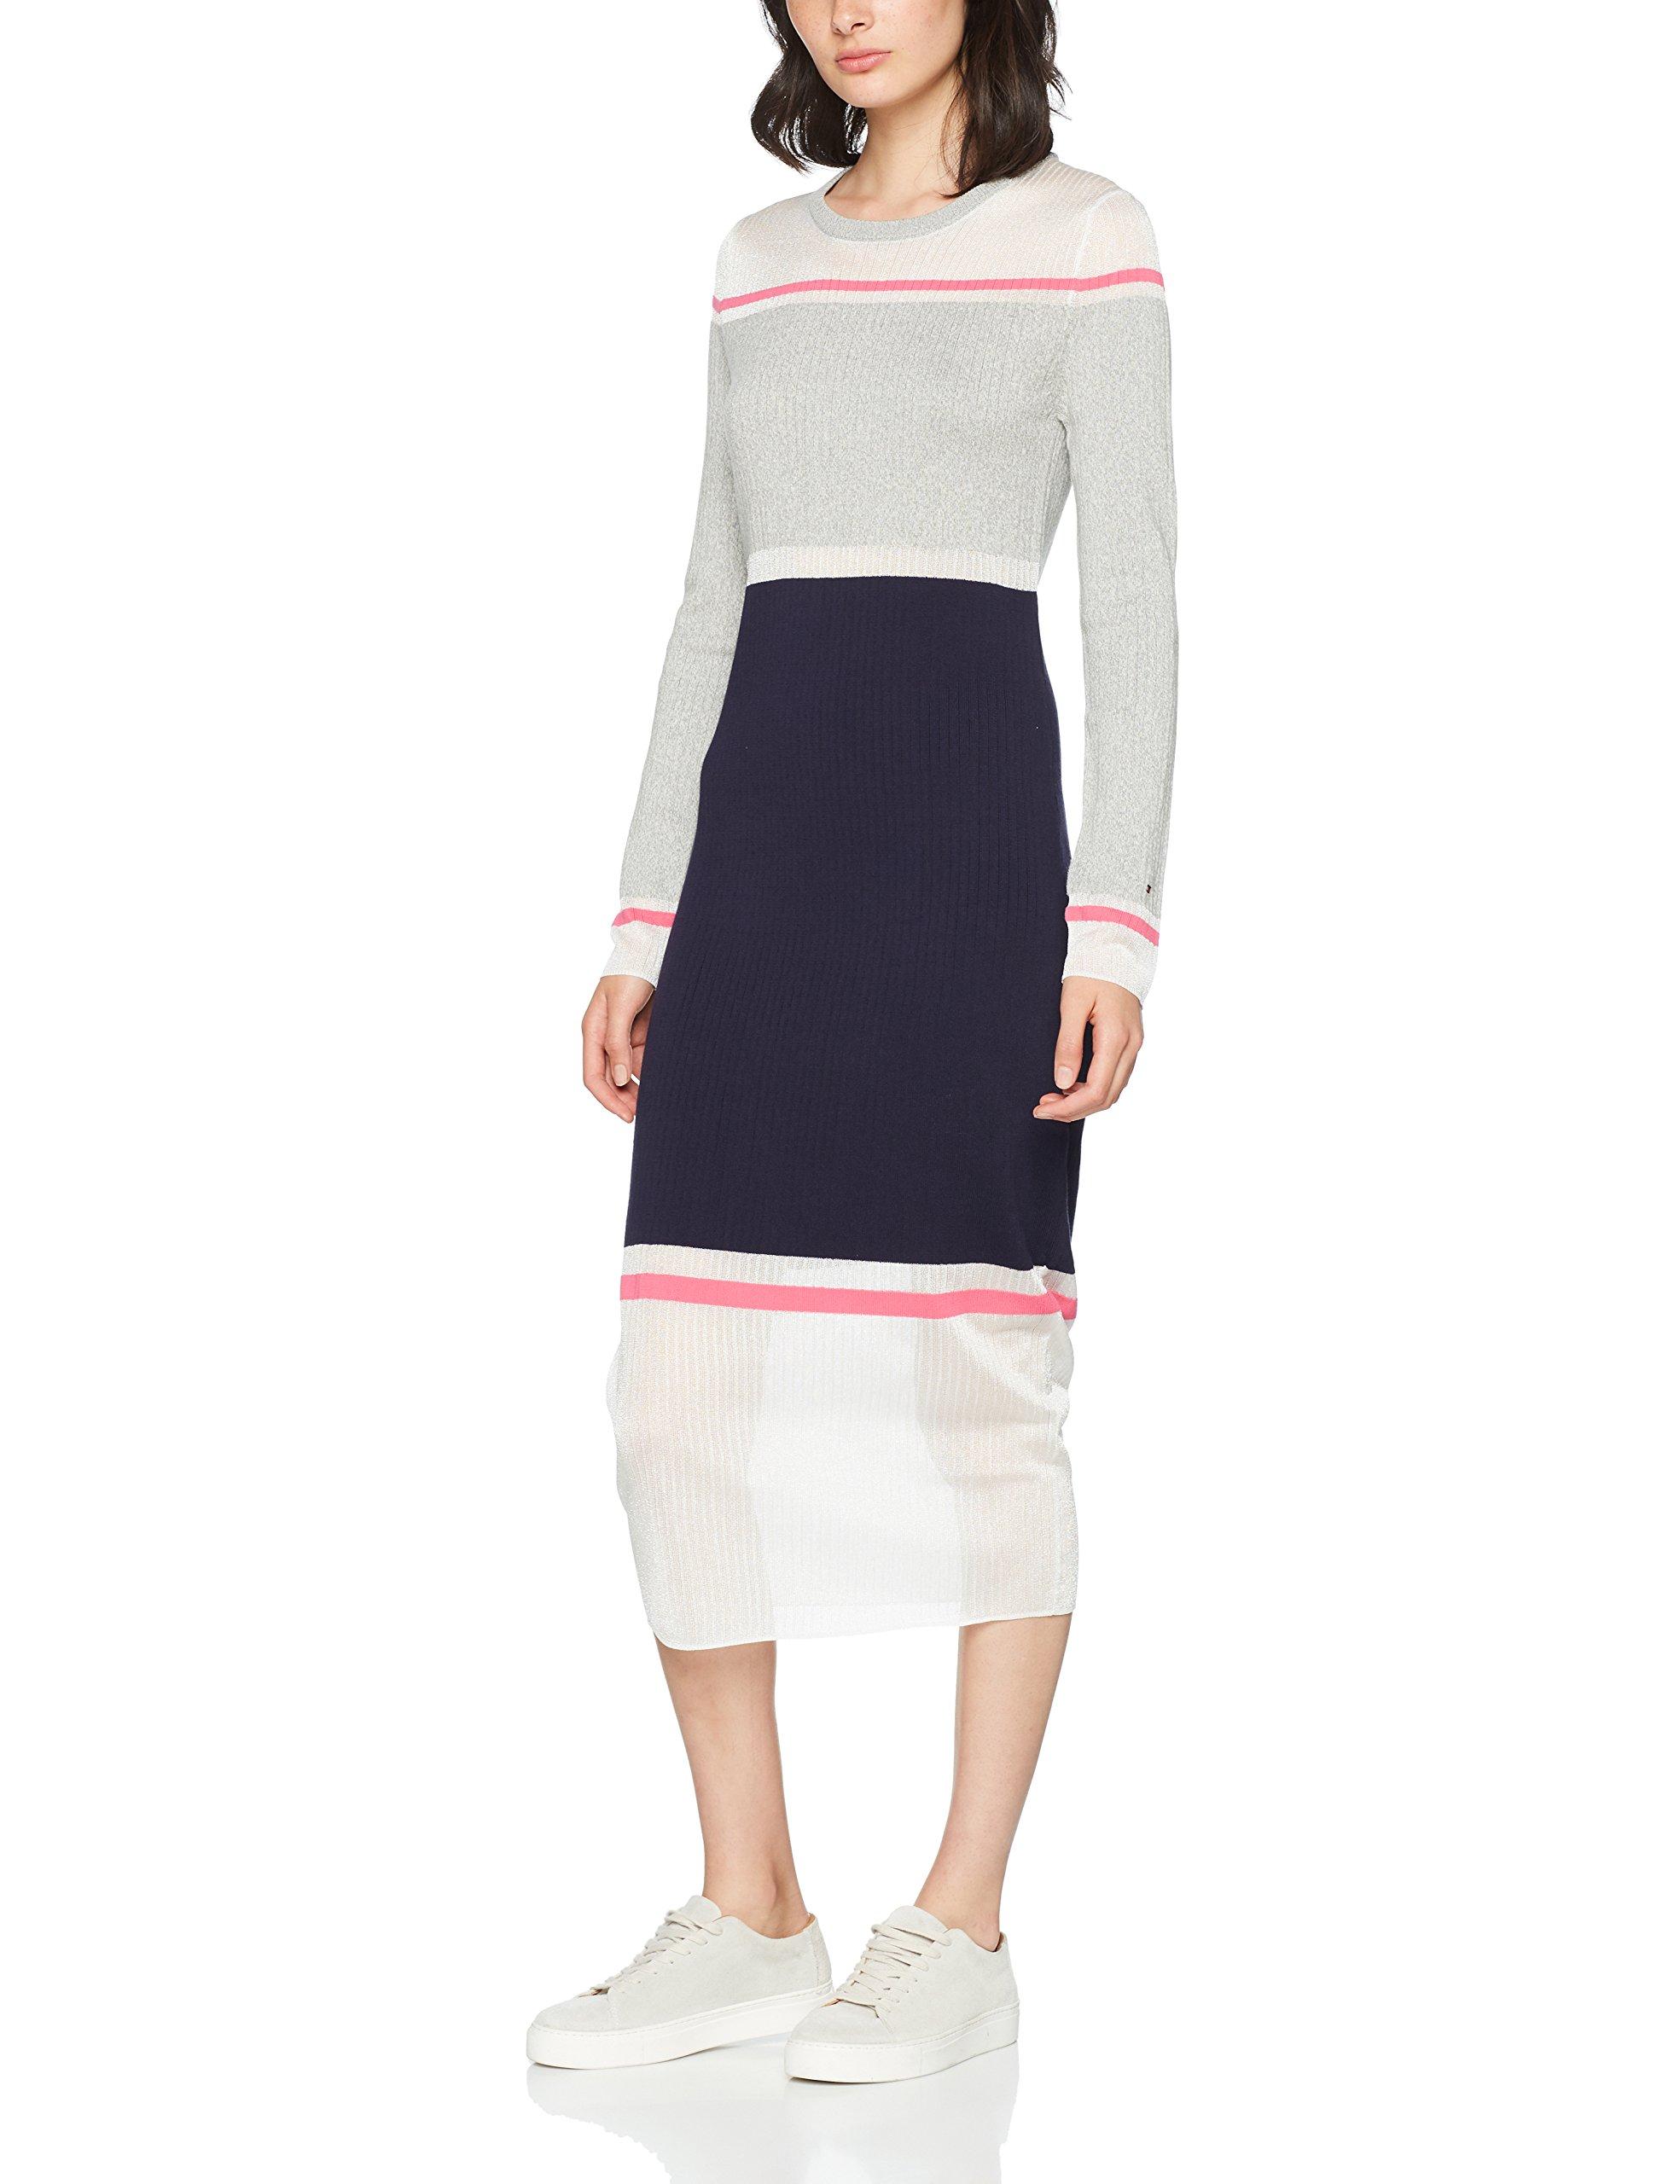 Tommy Hilfiger Gelda Sheer Contrast Dress Vestido para Mujer